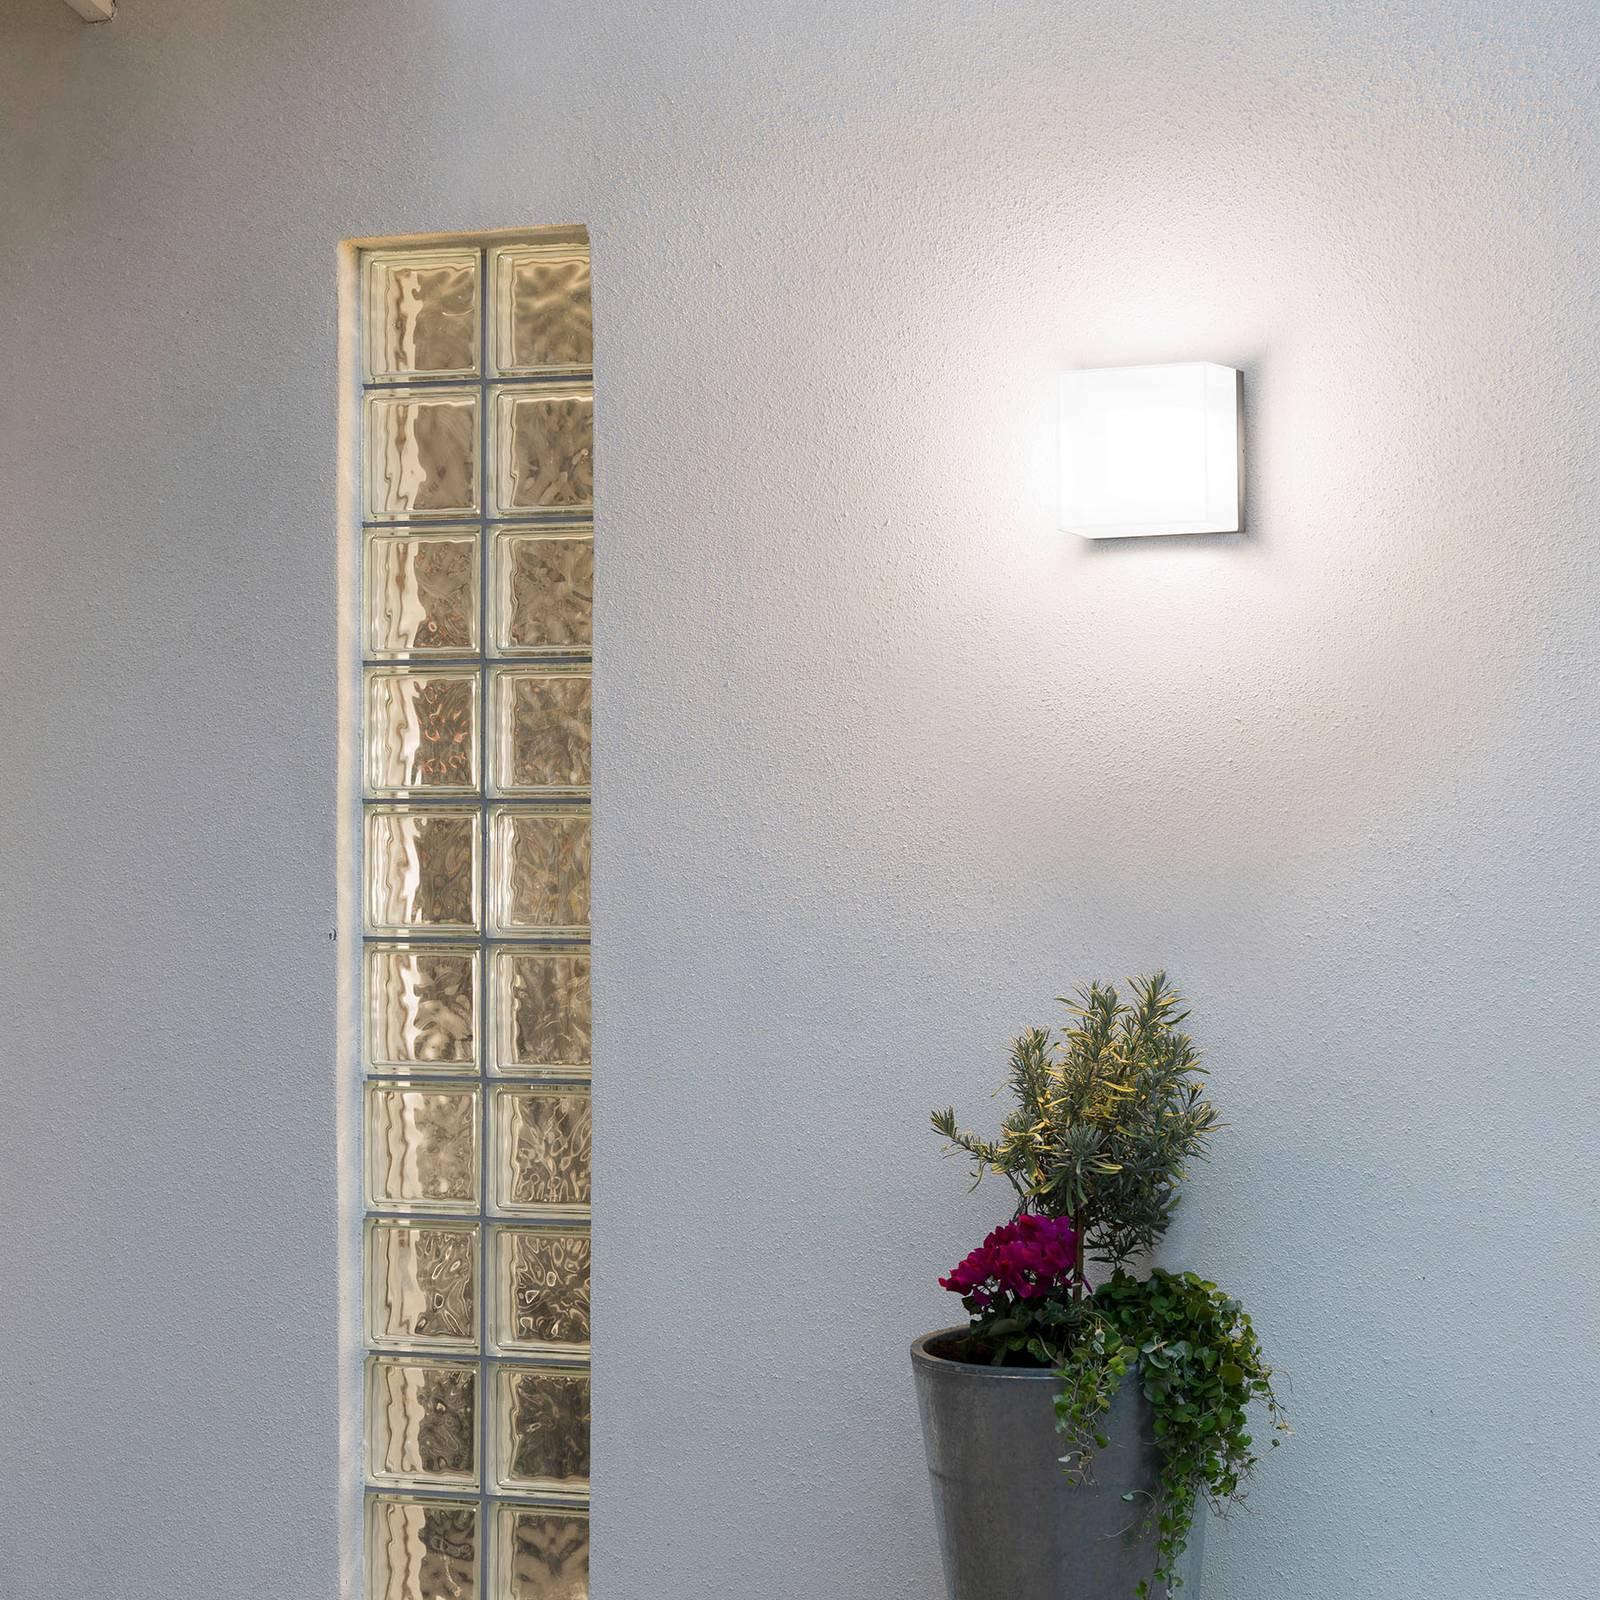 Sanremo utendørs vegglampe E27, 21 x 21 cm